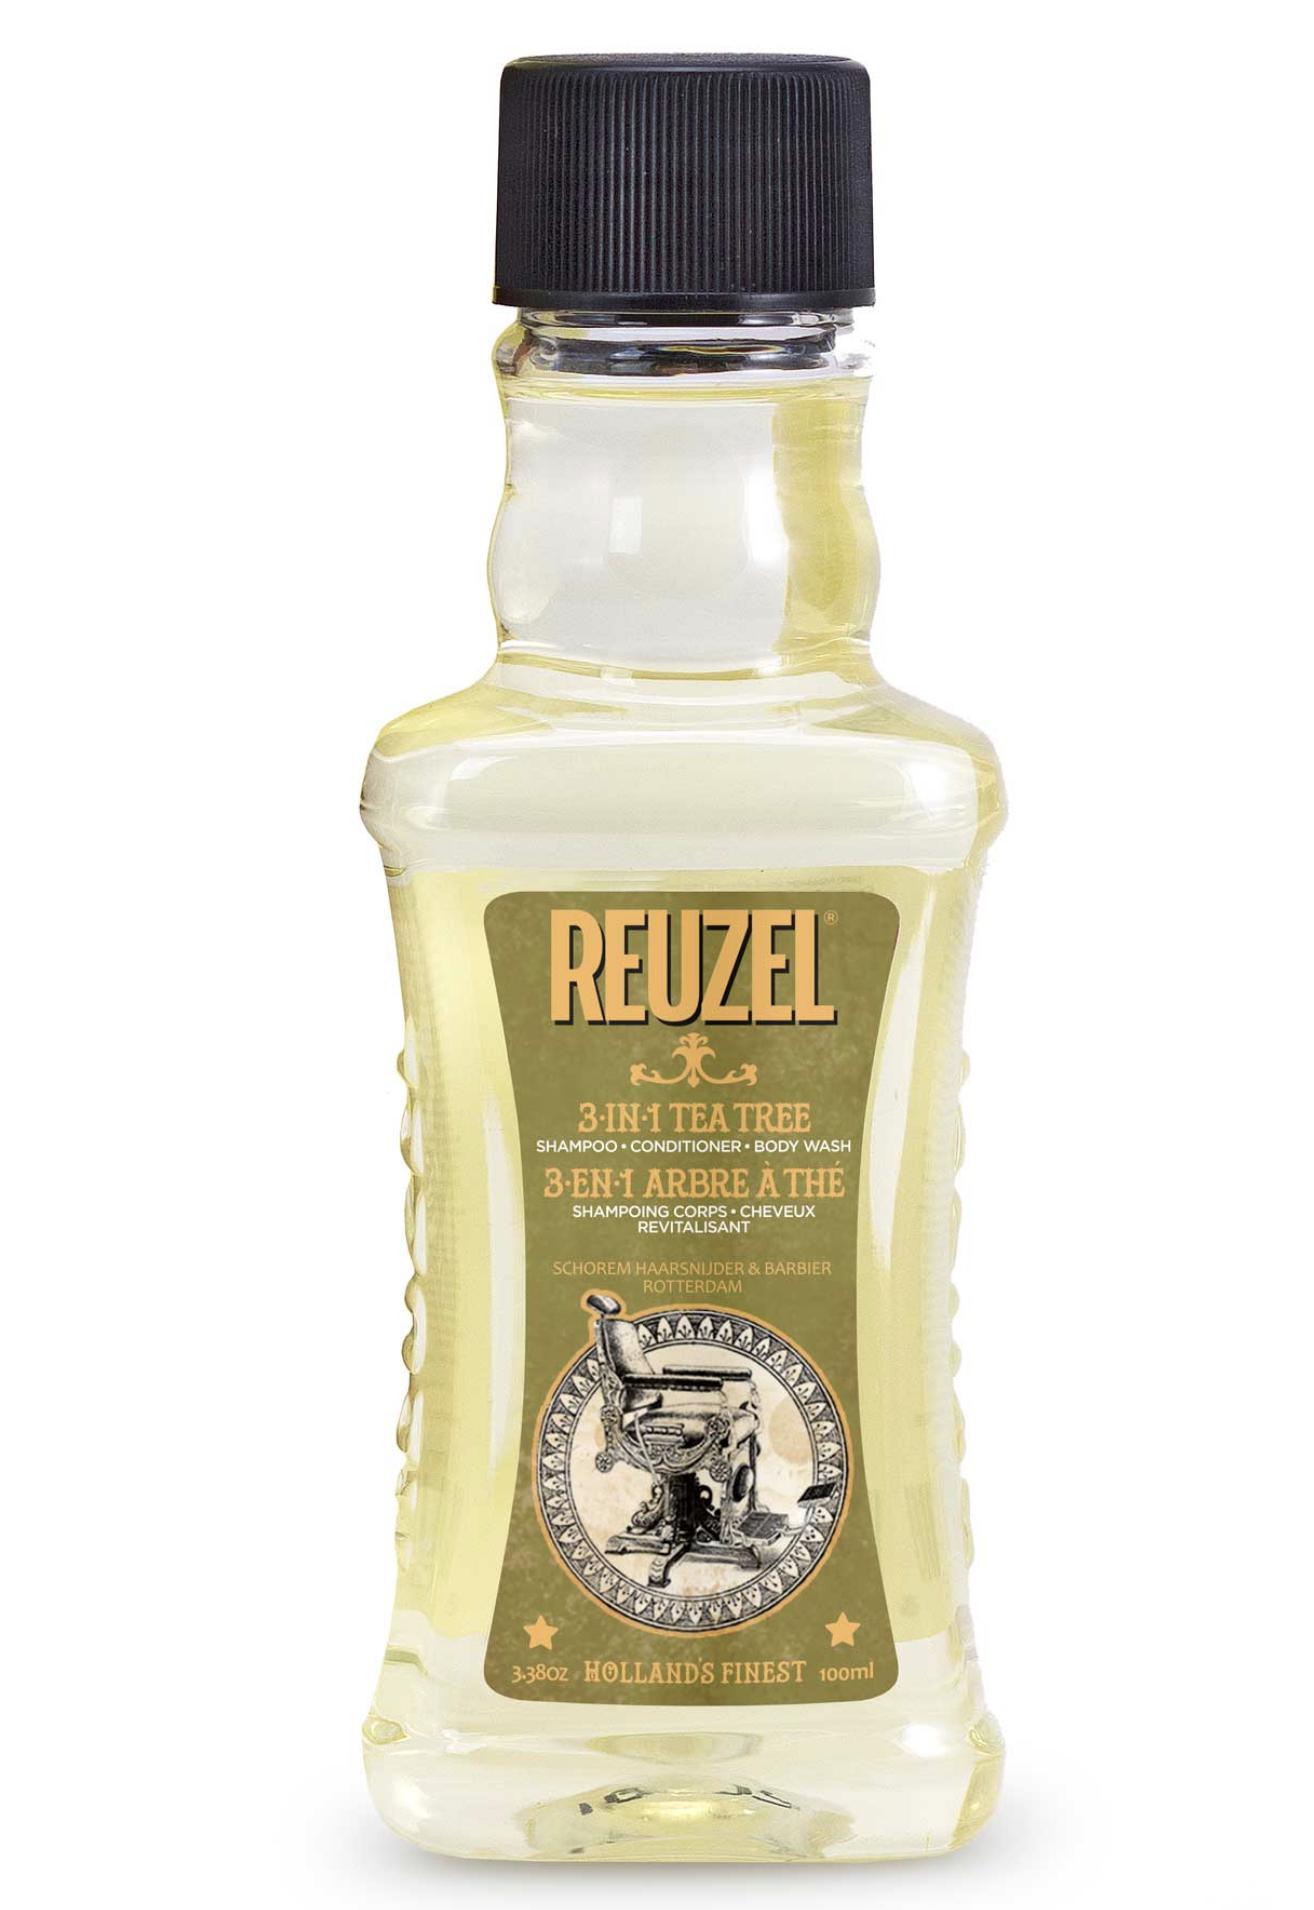 Reuzel 3-IN-1 Shampoo